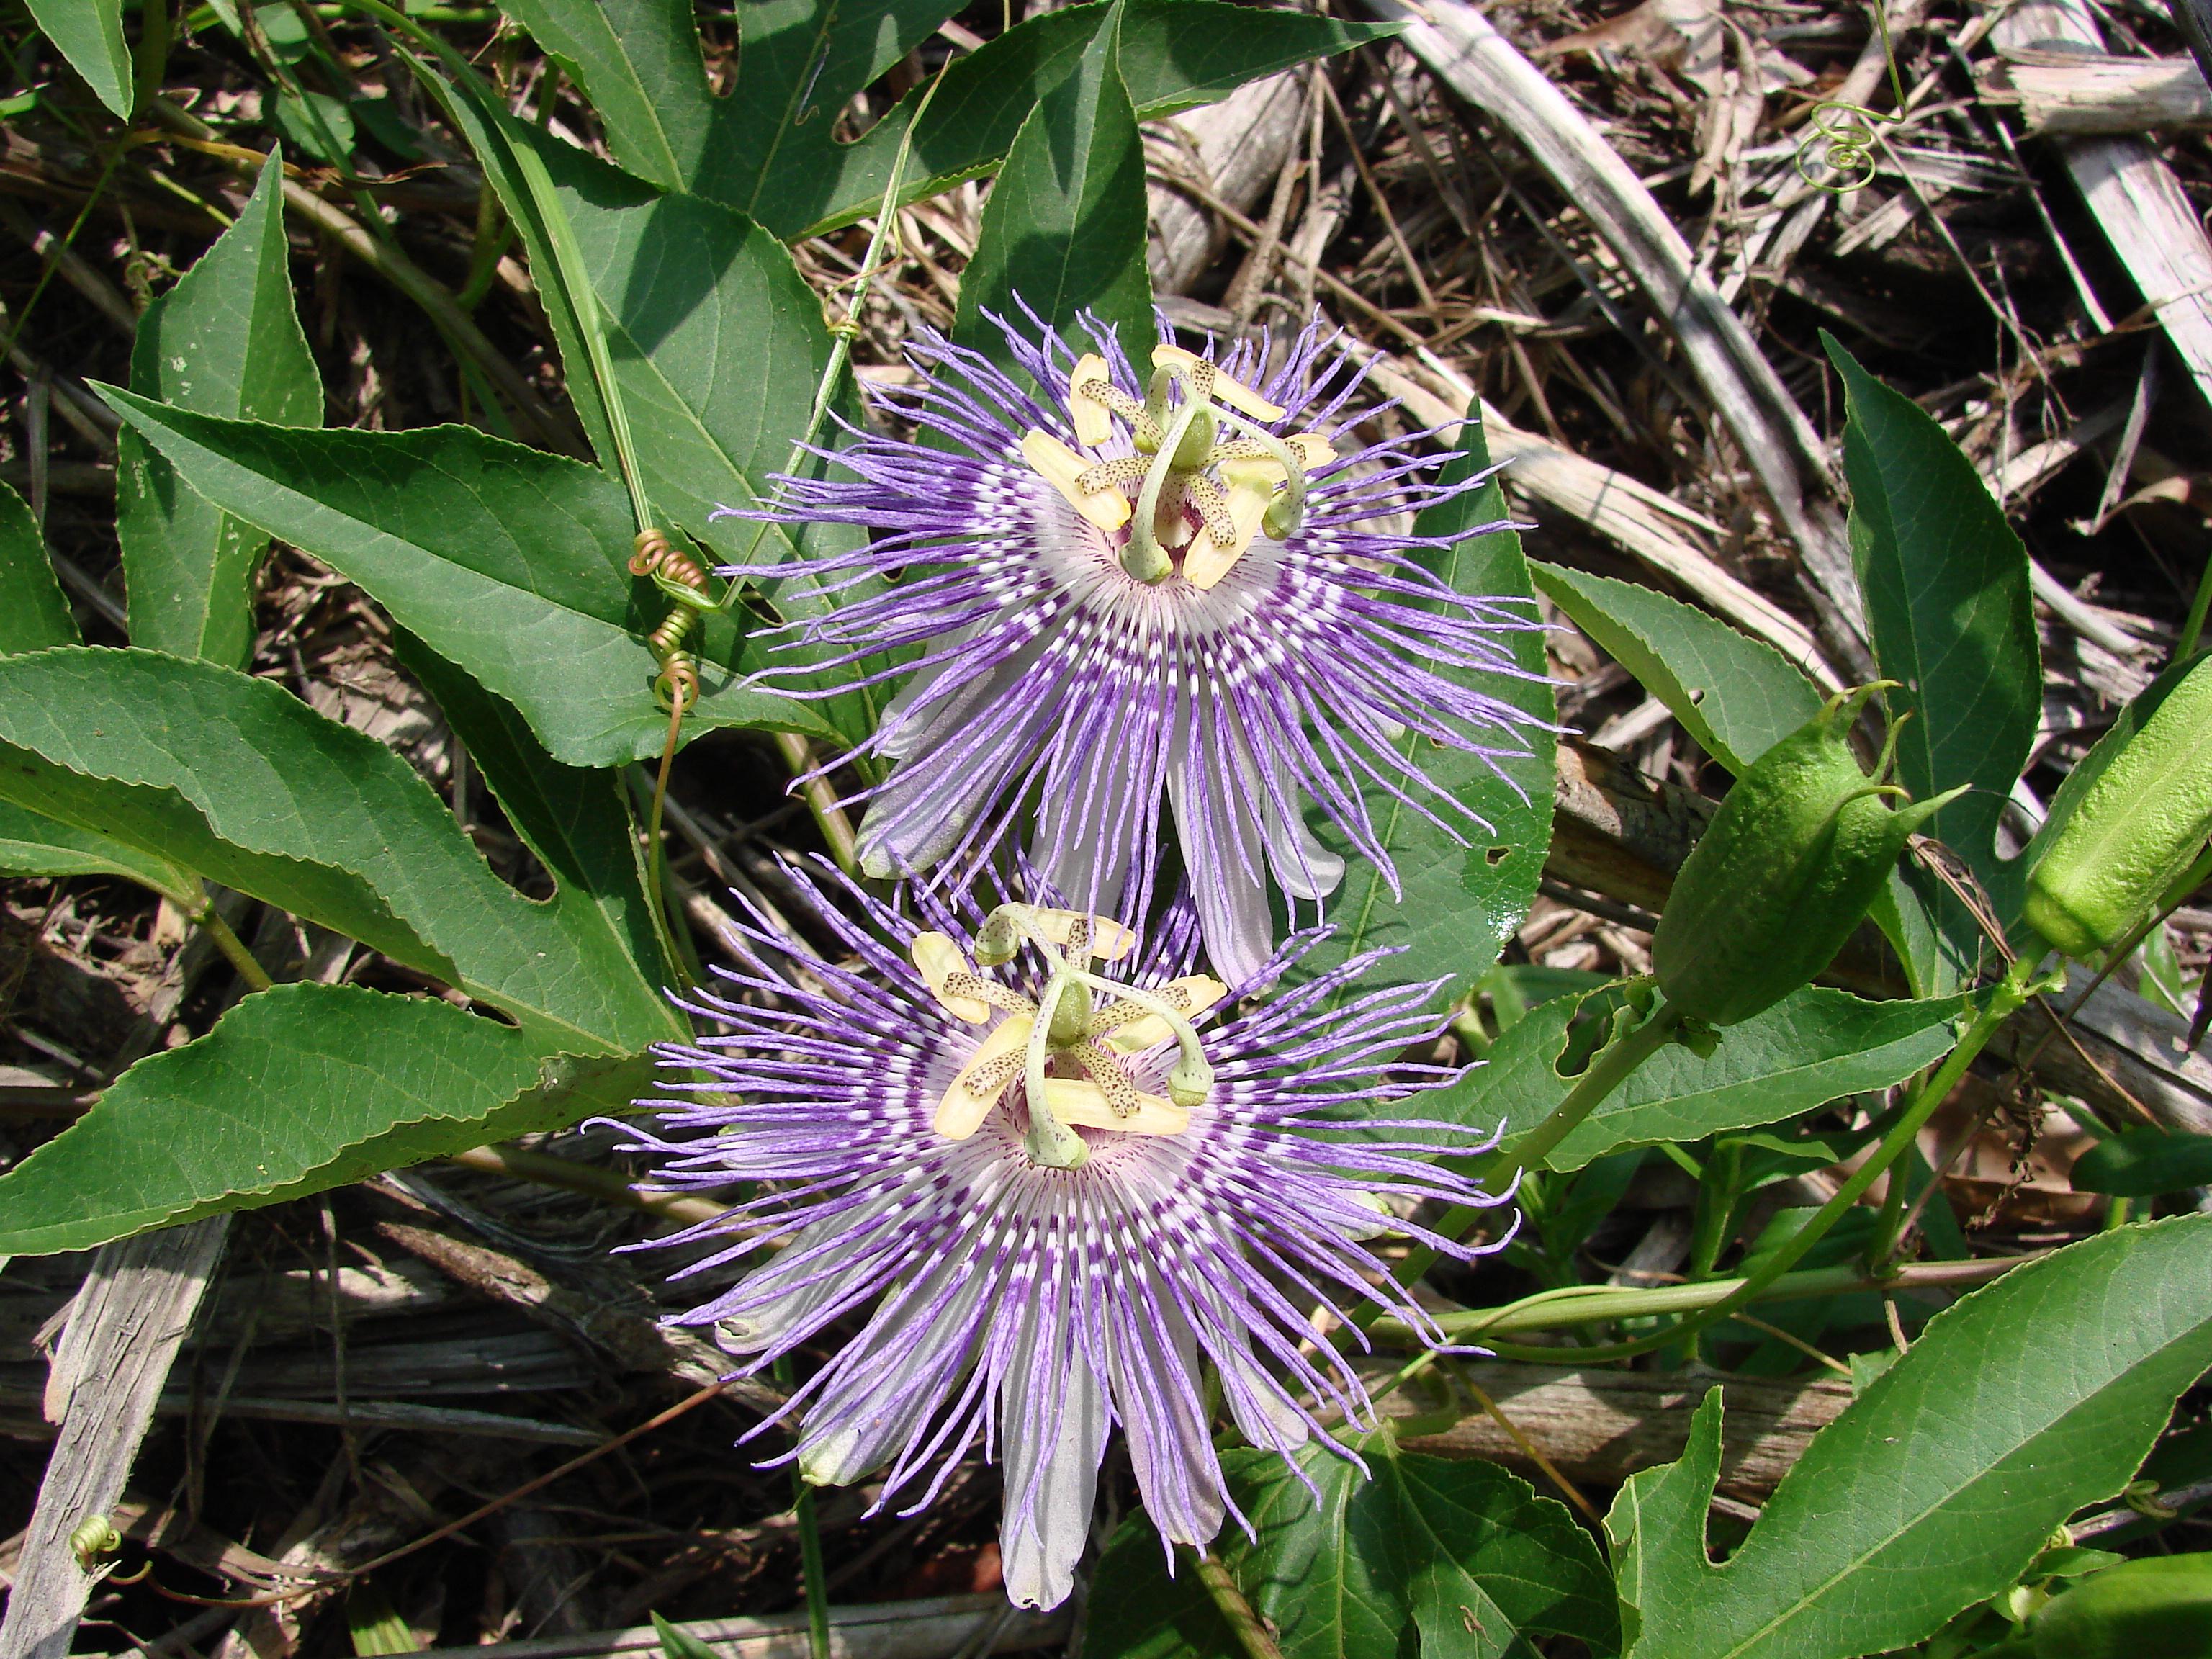 Image Related To Passiflora incarnata (Maypop or Native Passionflower)